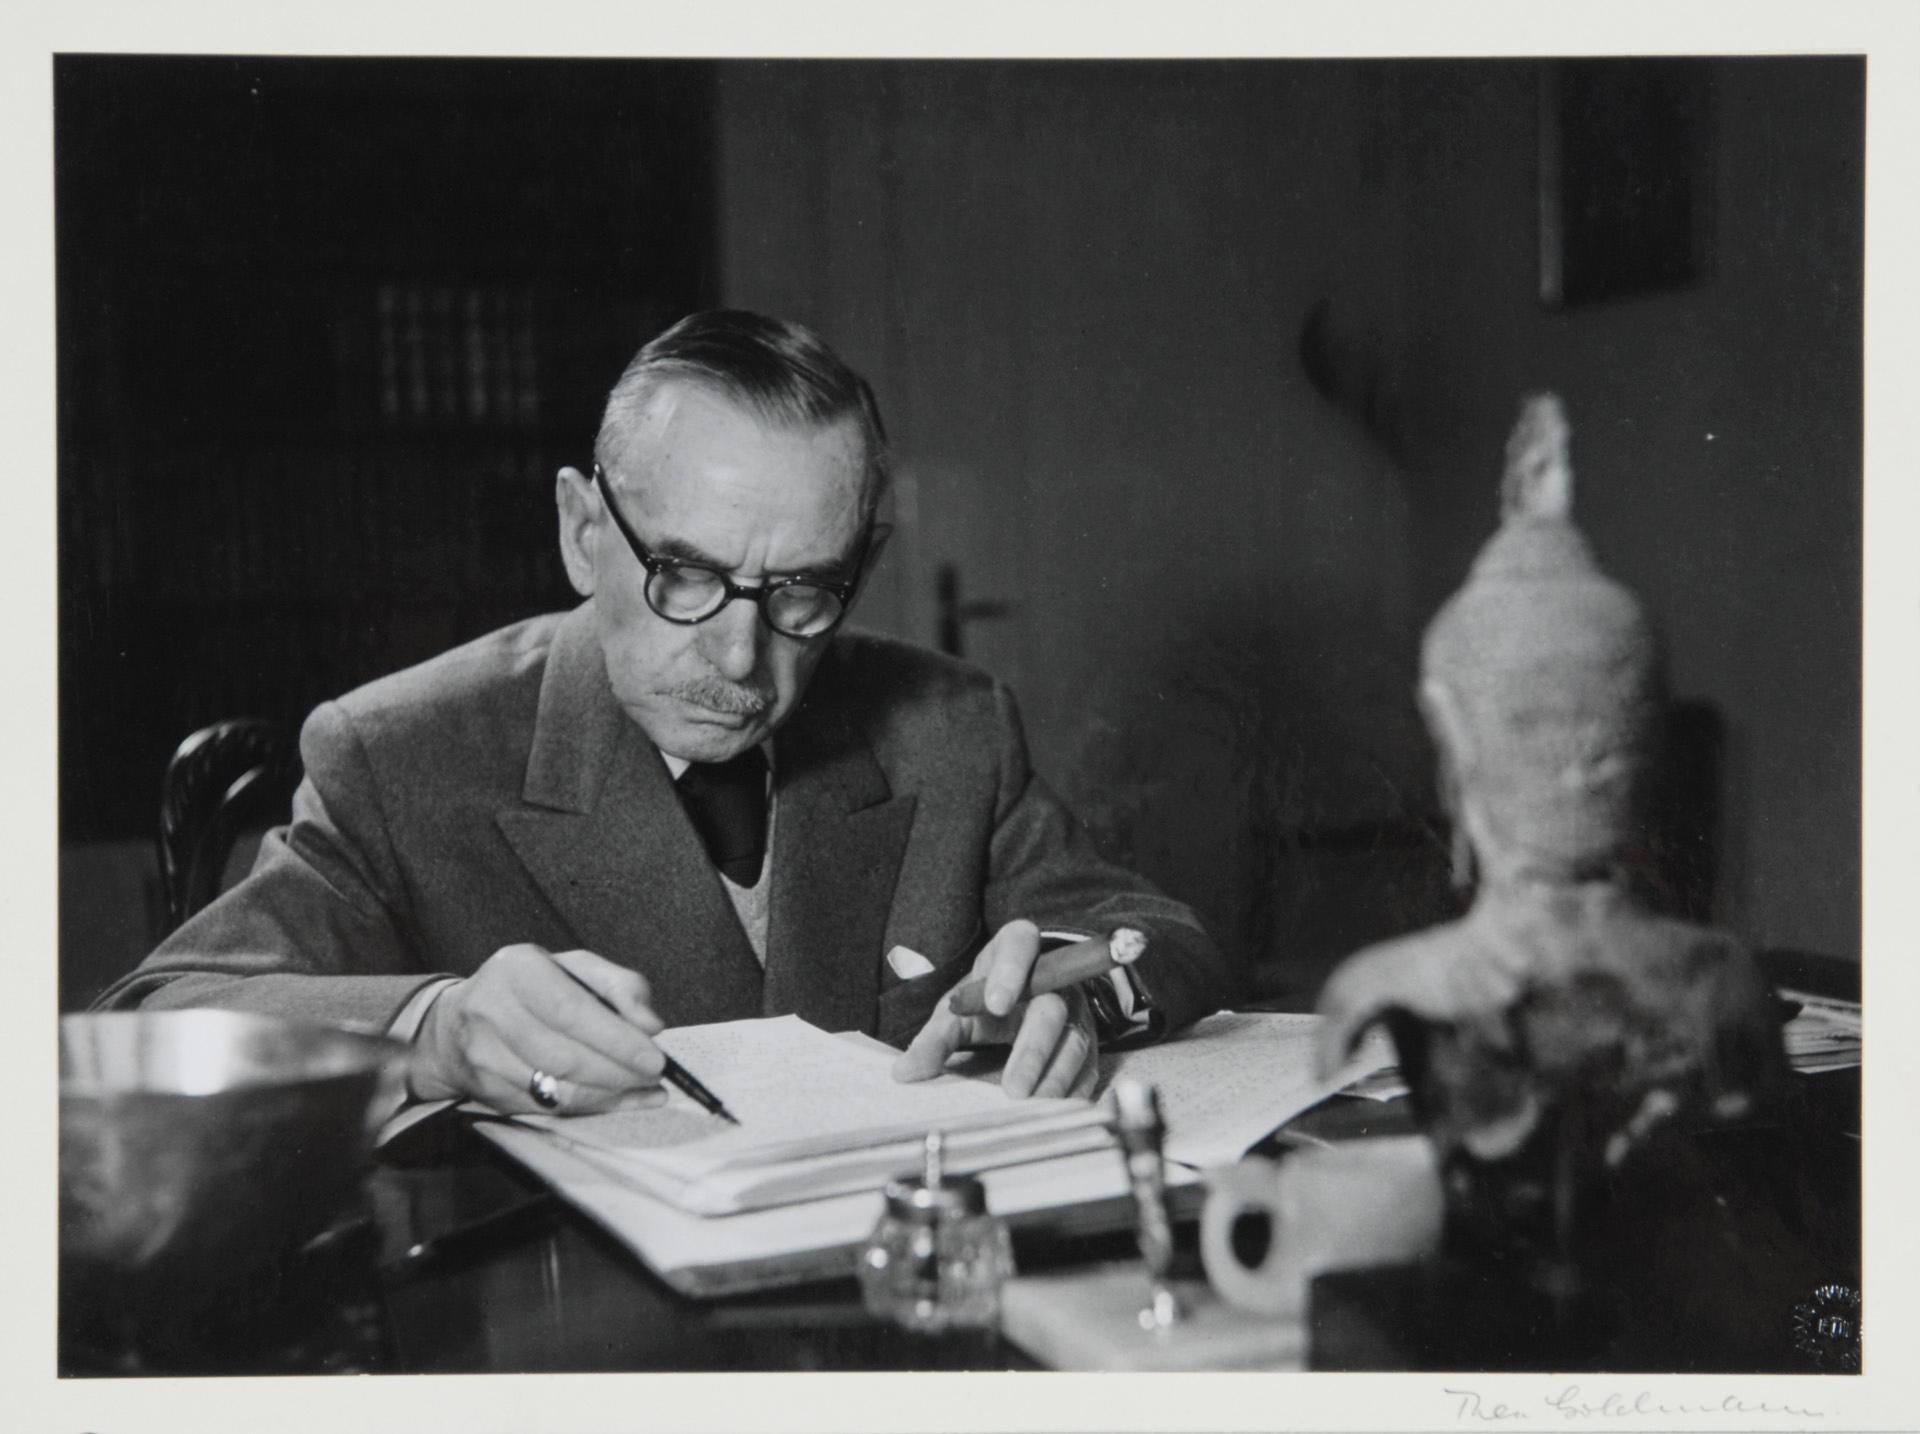 Goldmann Thea, Thomas Mann am Schreibtisch (Thomas Mann at the Desk)